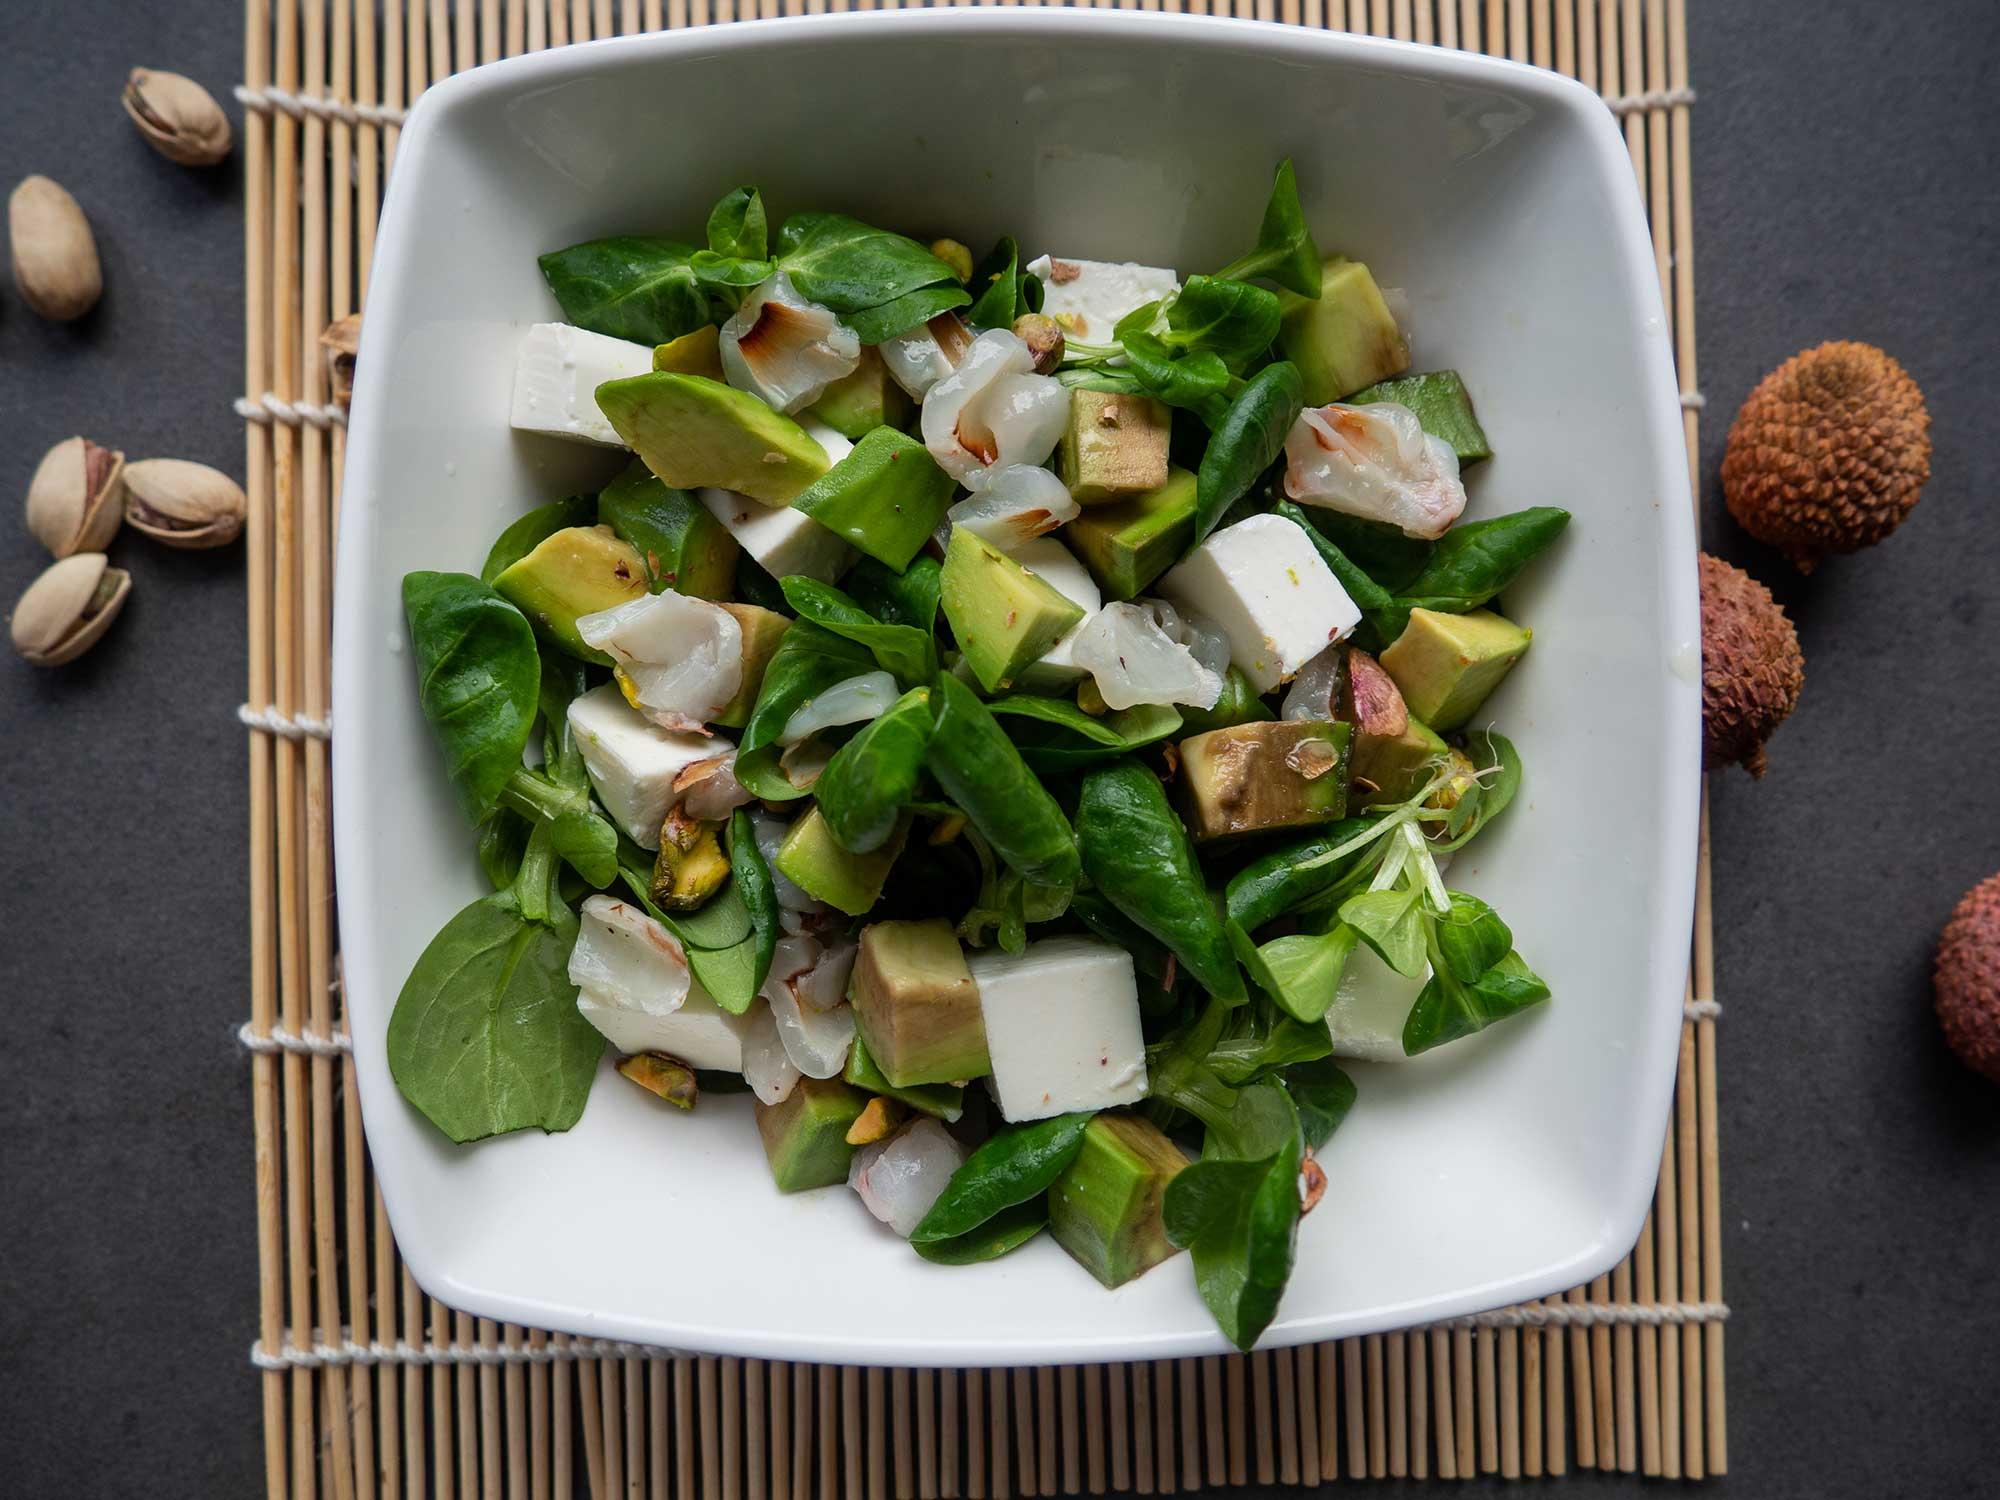 Salad with avocado